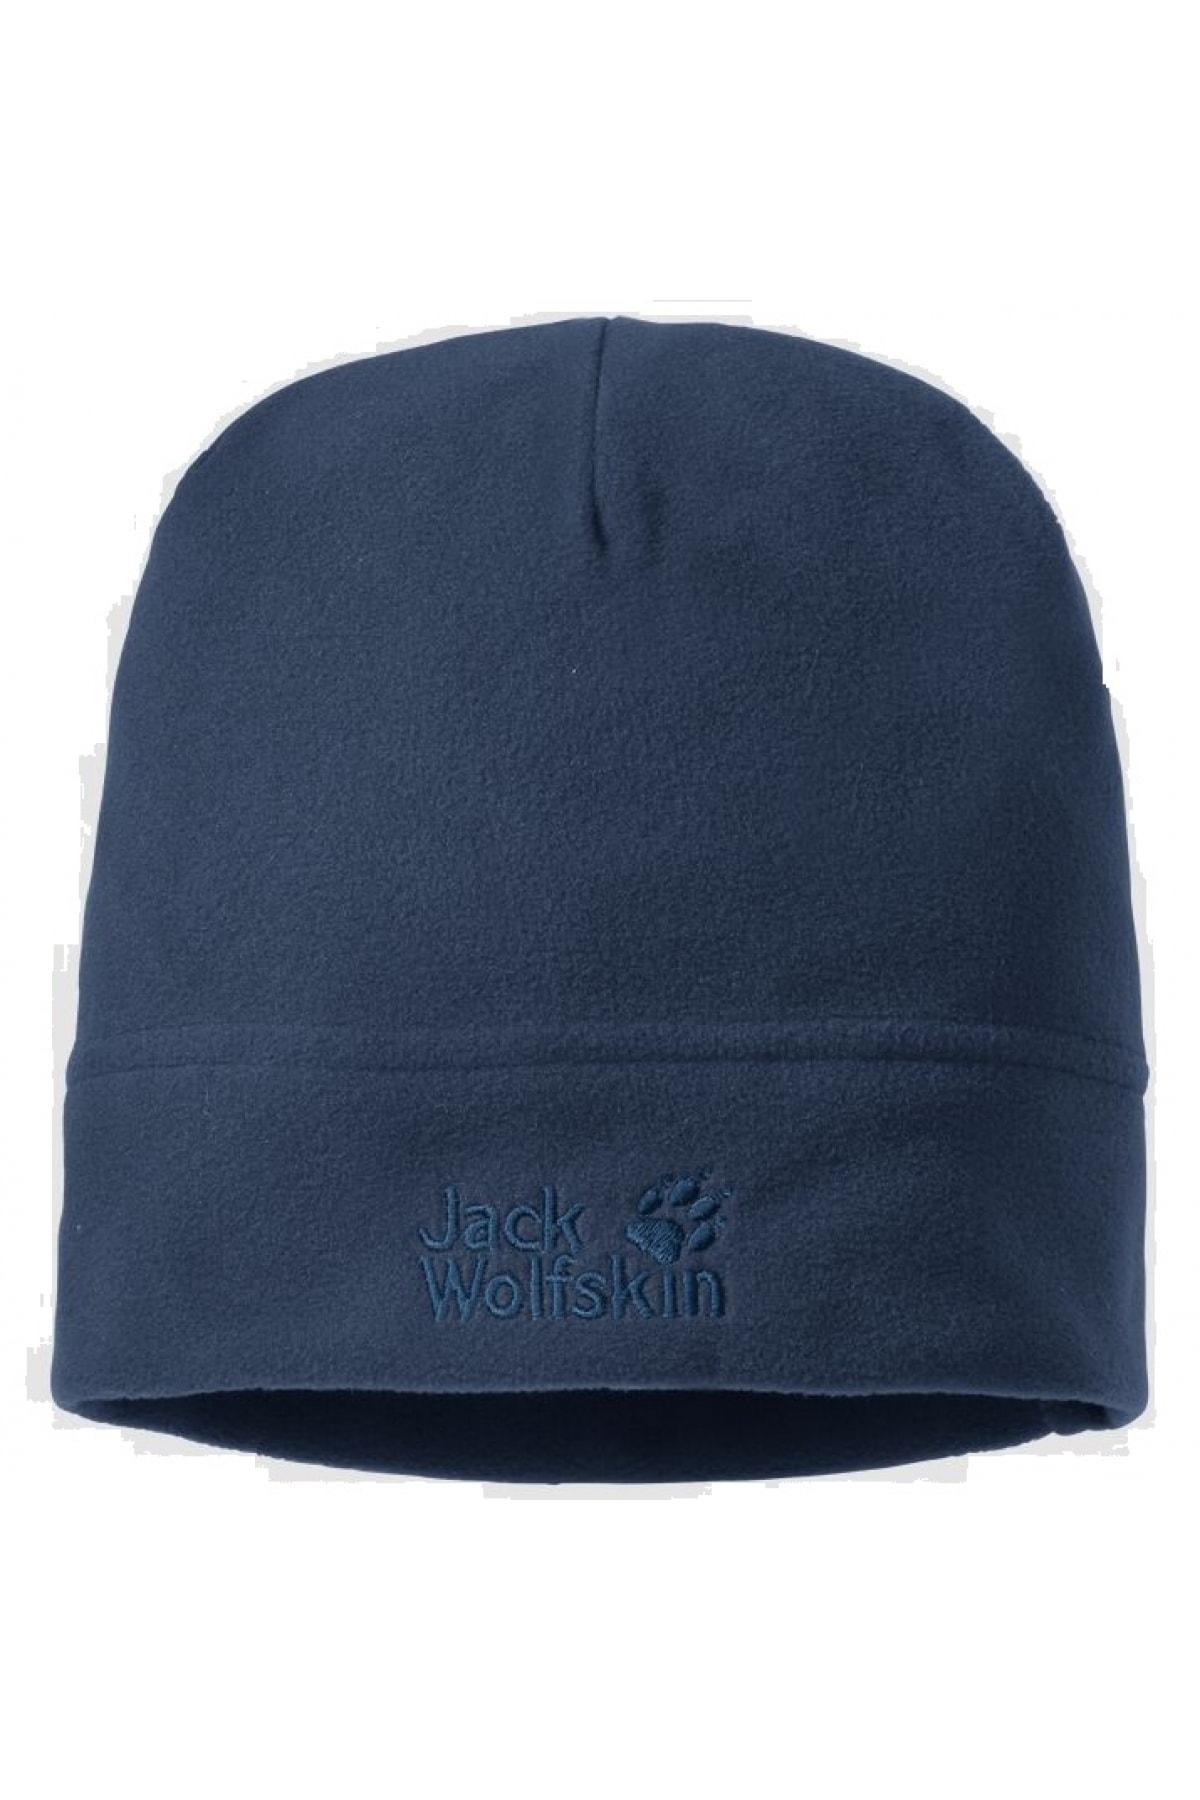 Jack Wolfskin Real Stuff Şapka 19590 1